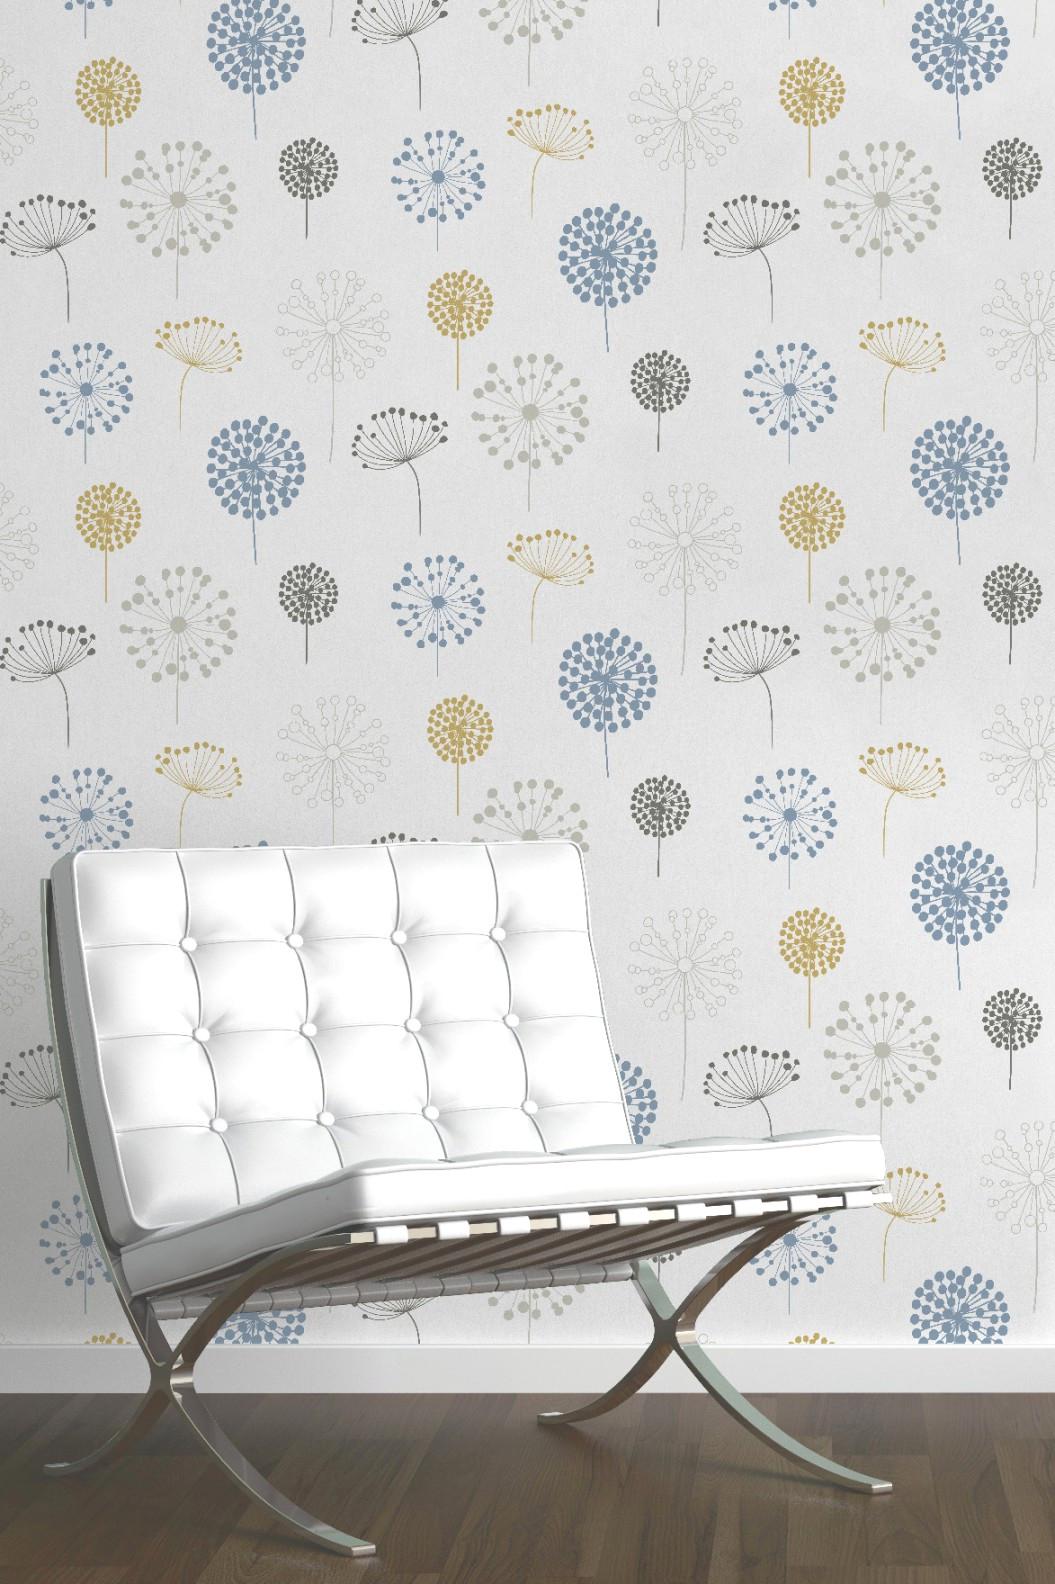 papier peint g om trique castorama frais photos tapisserie. Black Bedroom Furniture Sets. Home Design Ideas